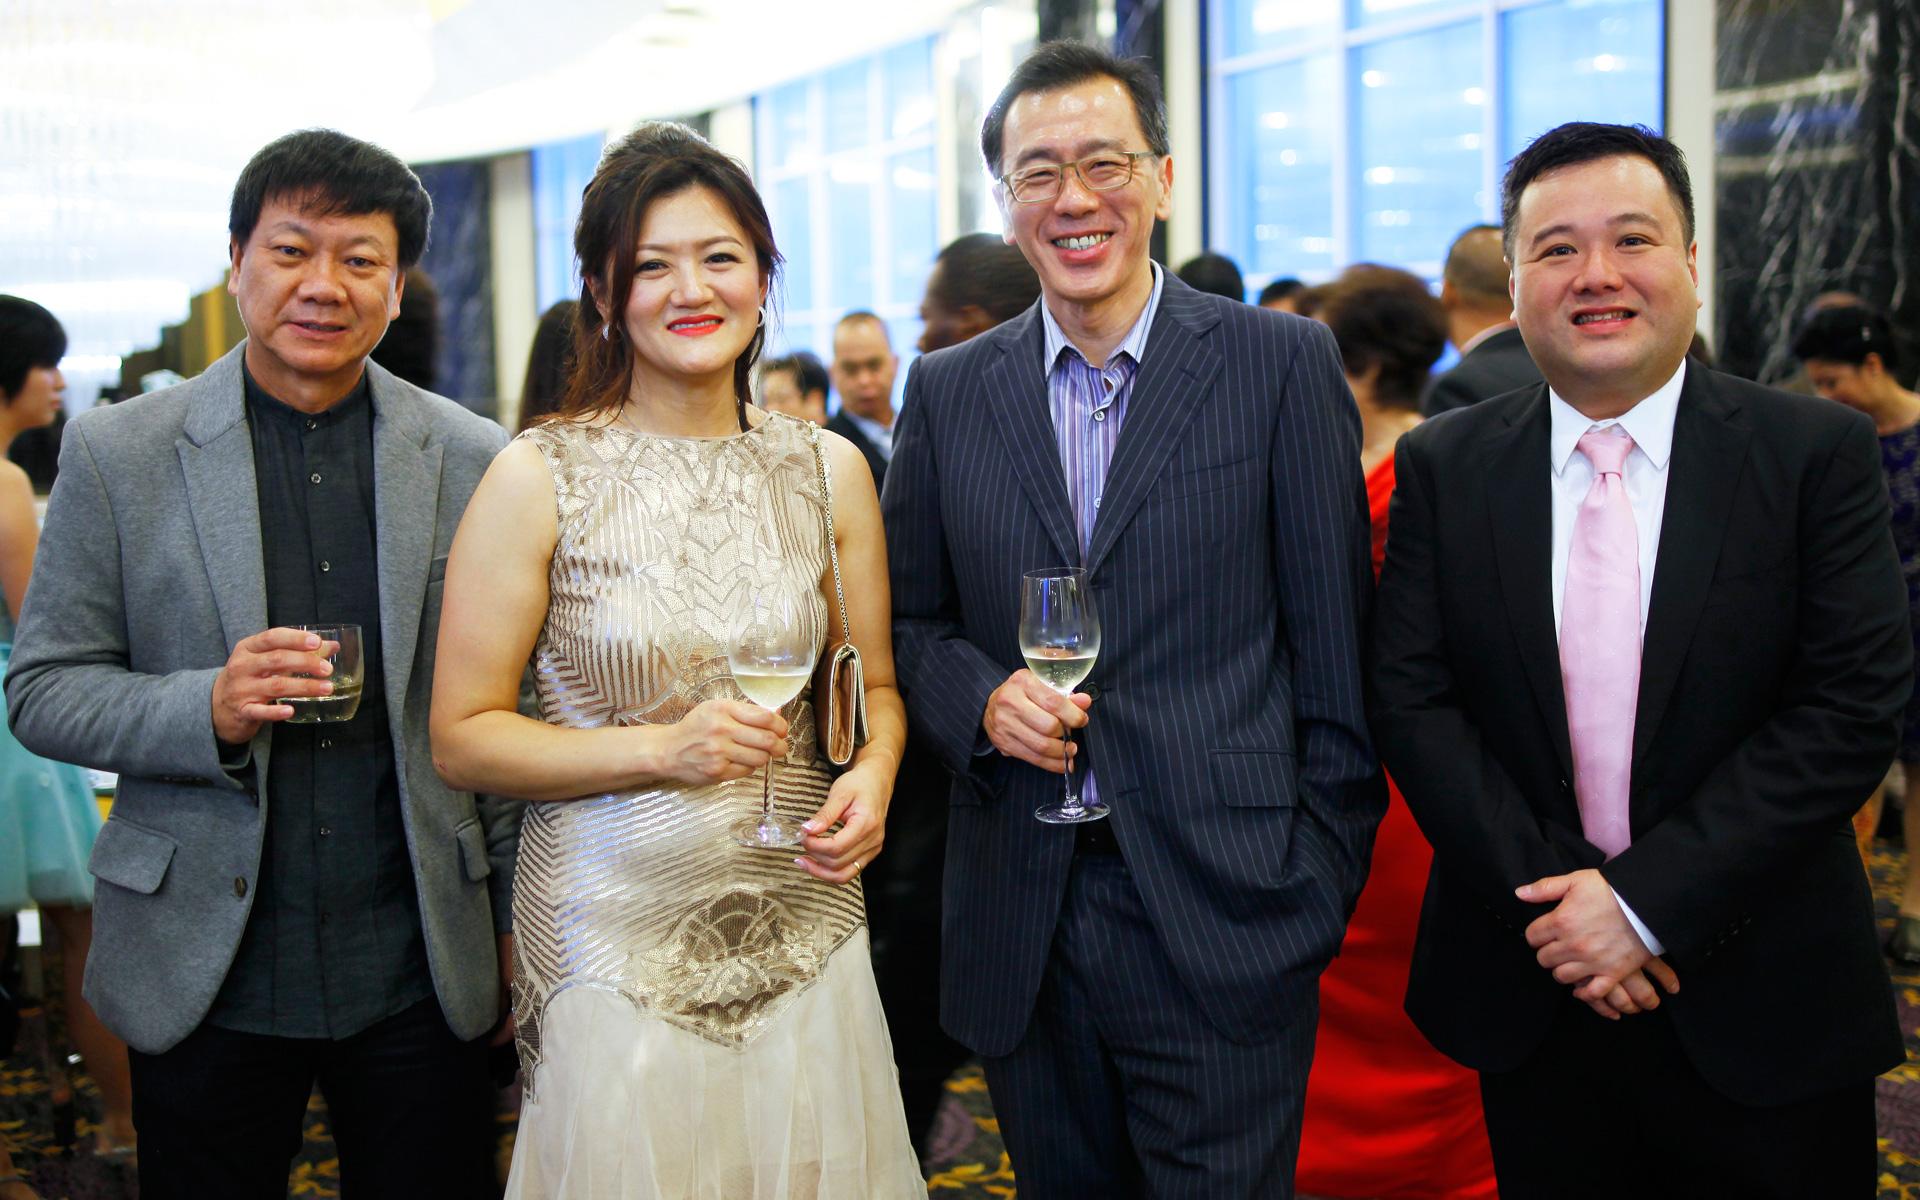 YC Tan, Kimmie Lam, Seo Han Soo and Kevin Lim